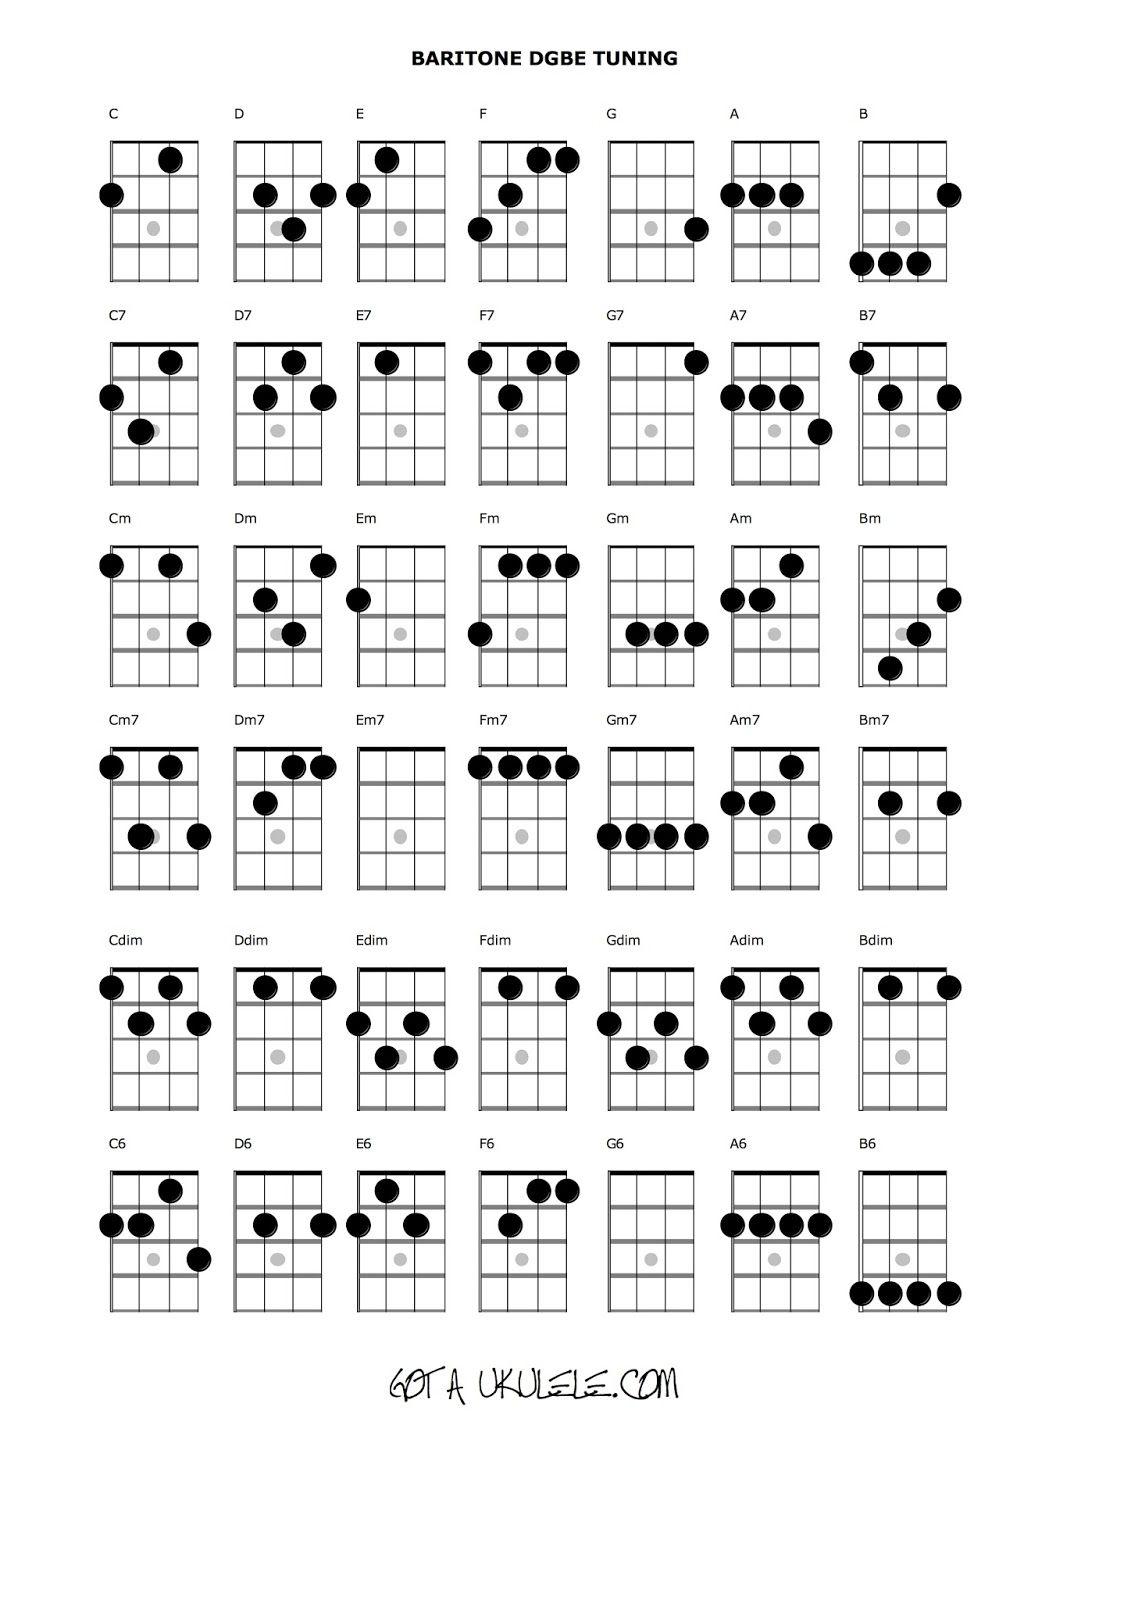 ukulele chord chart baritone charts chords uke tuning songs diagrams beginners music guitar sheet cords soprano fretboard banjo easy circle